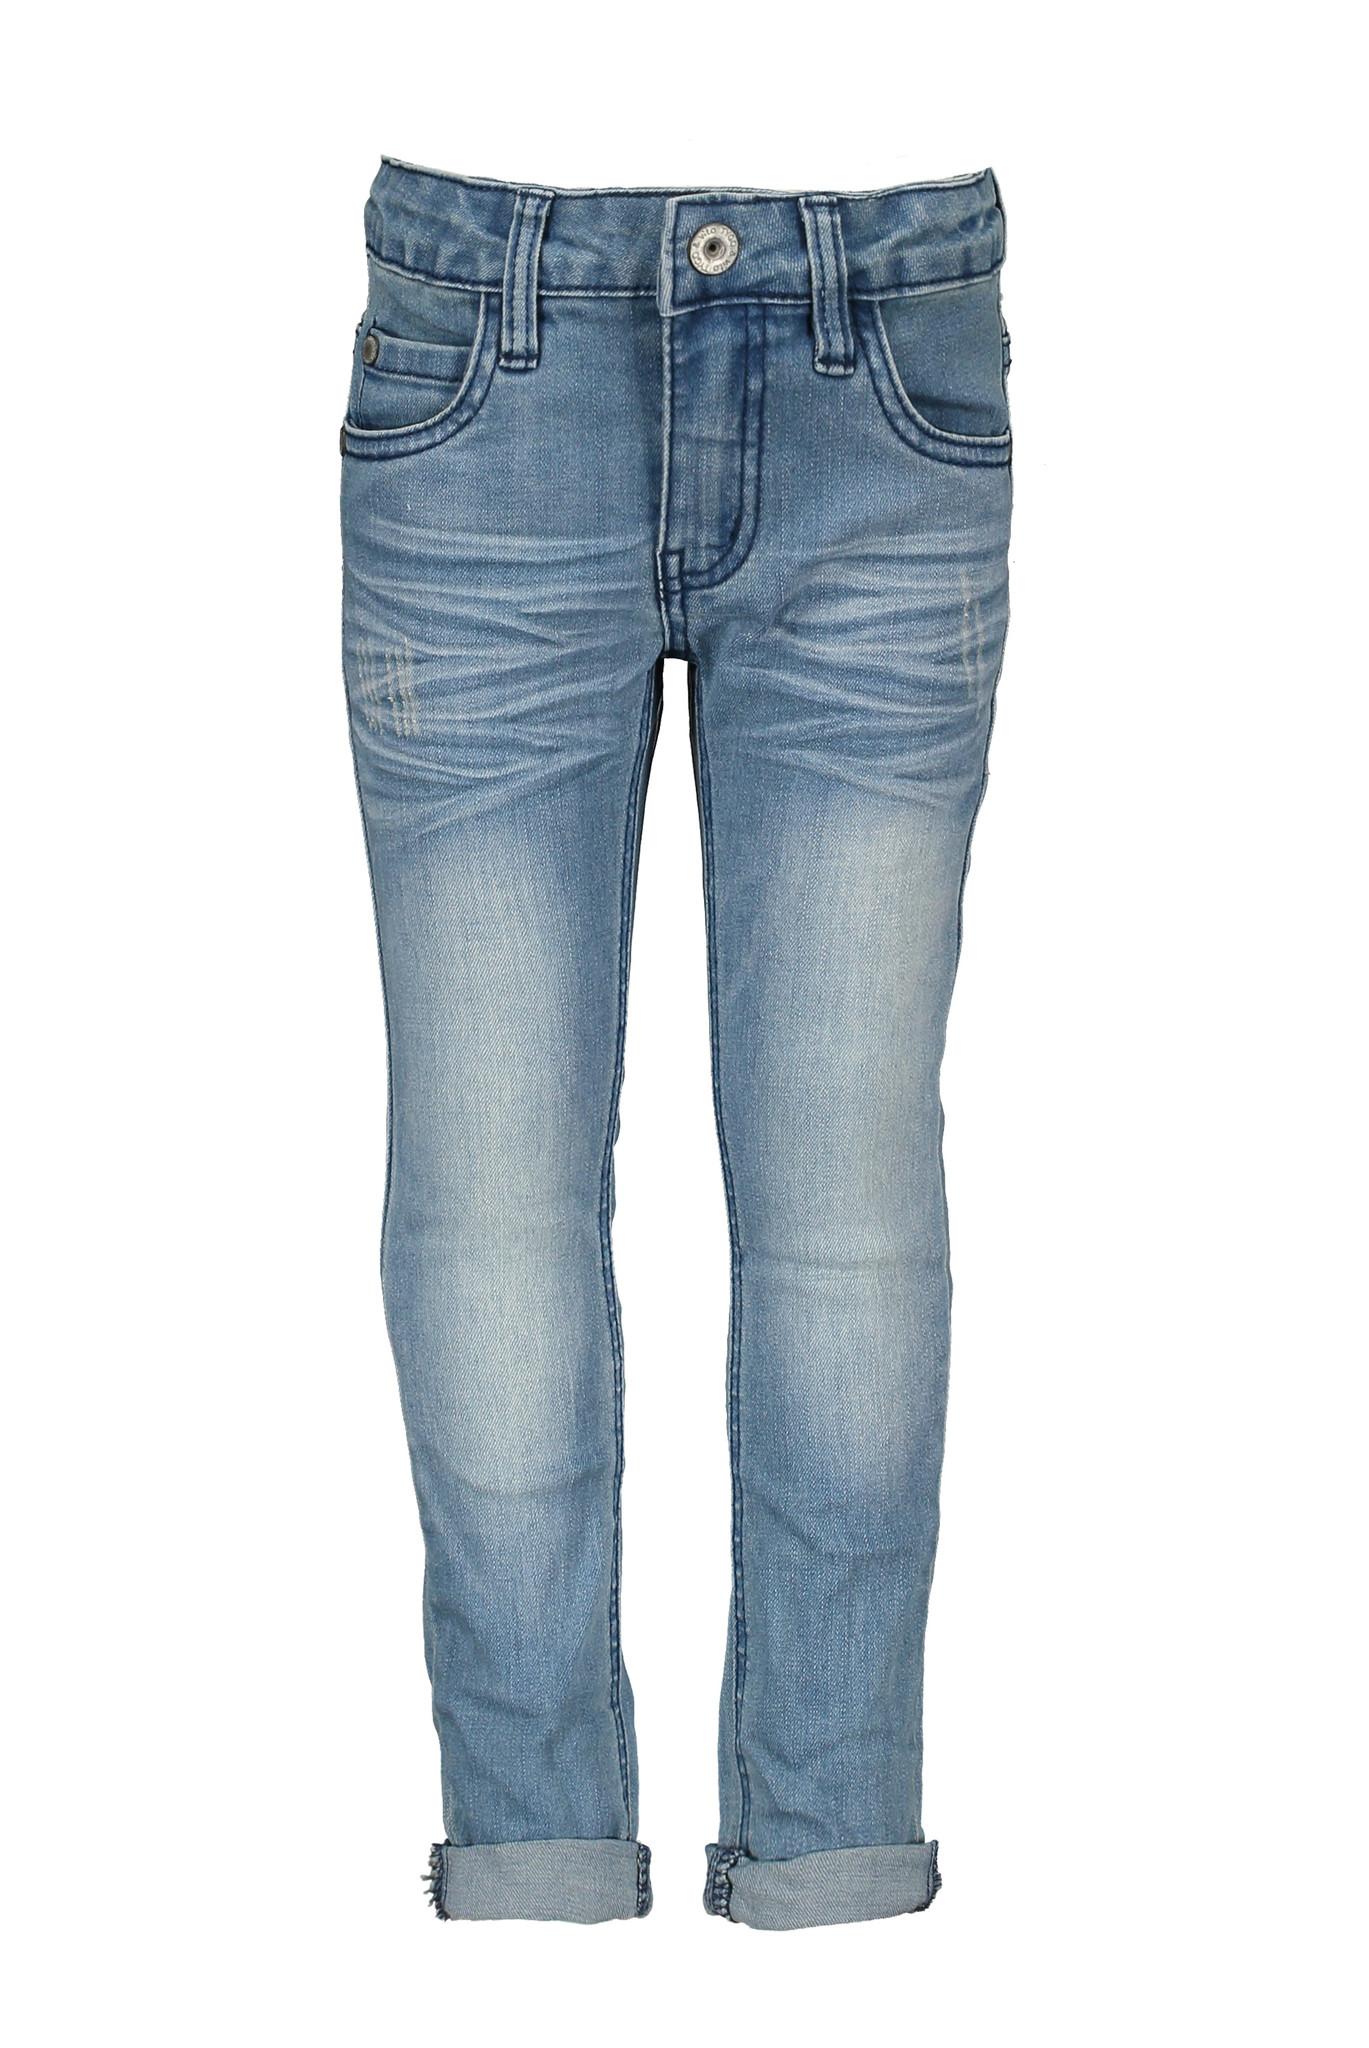 TYGO&vito TYGO&vito spijkerbroek skinny fit stretch jeans